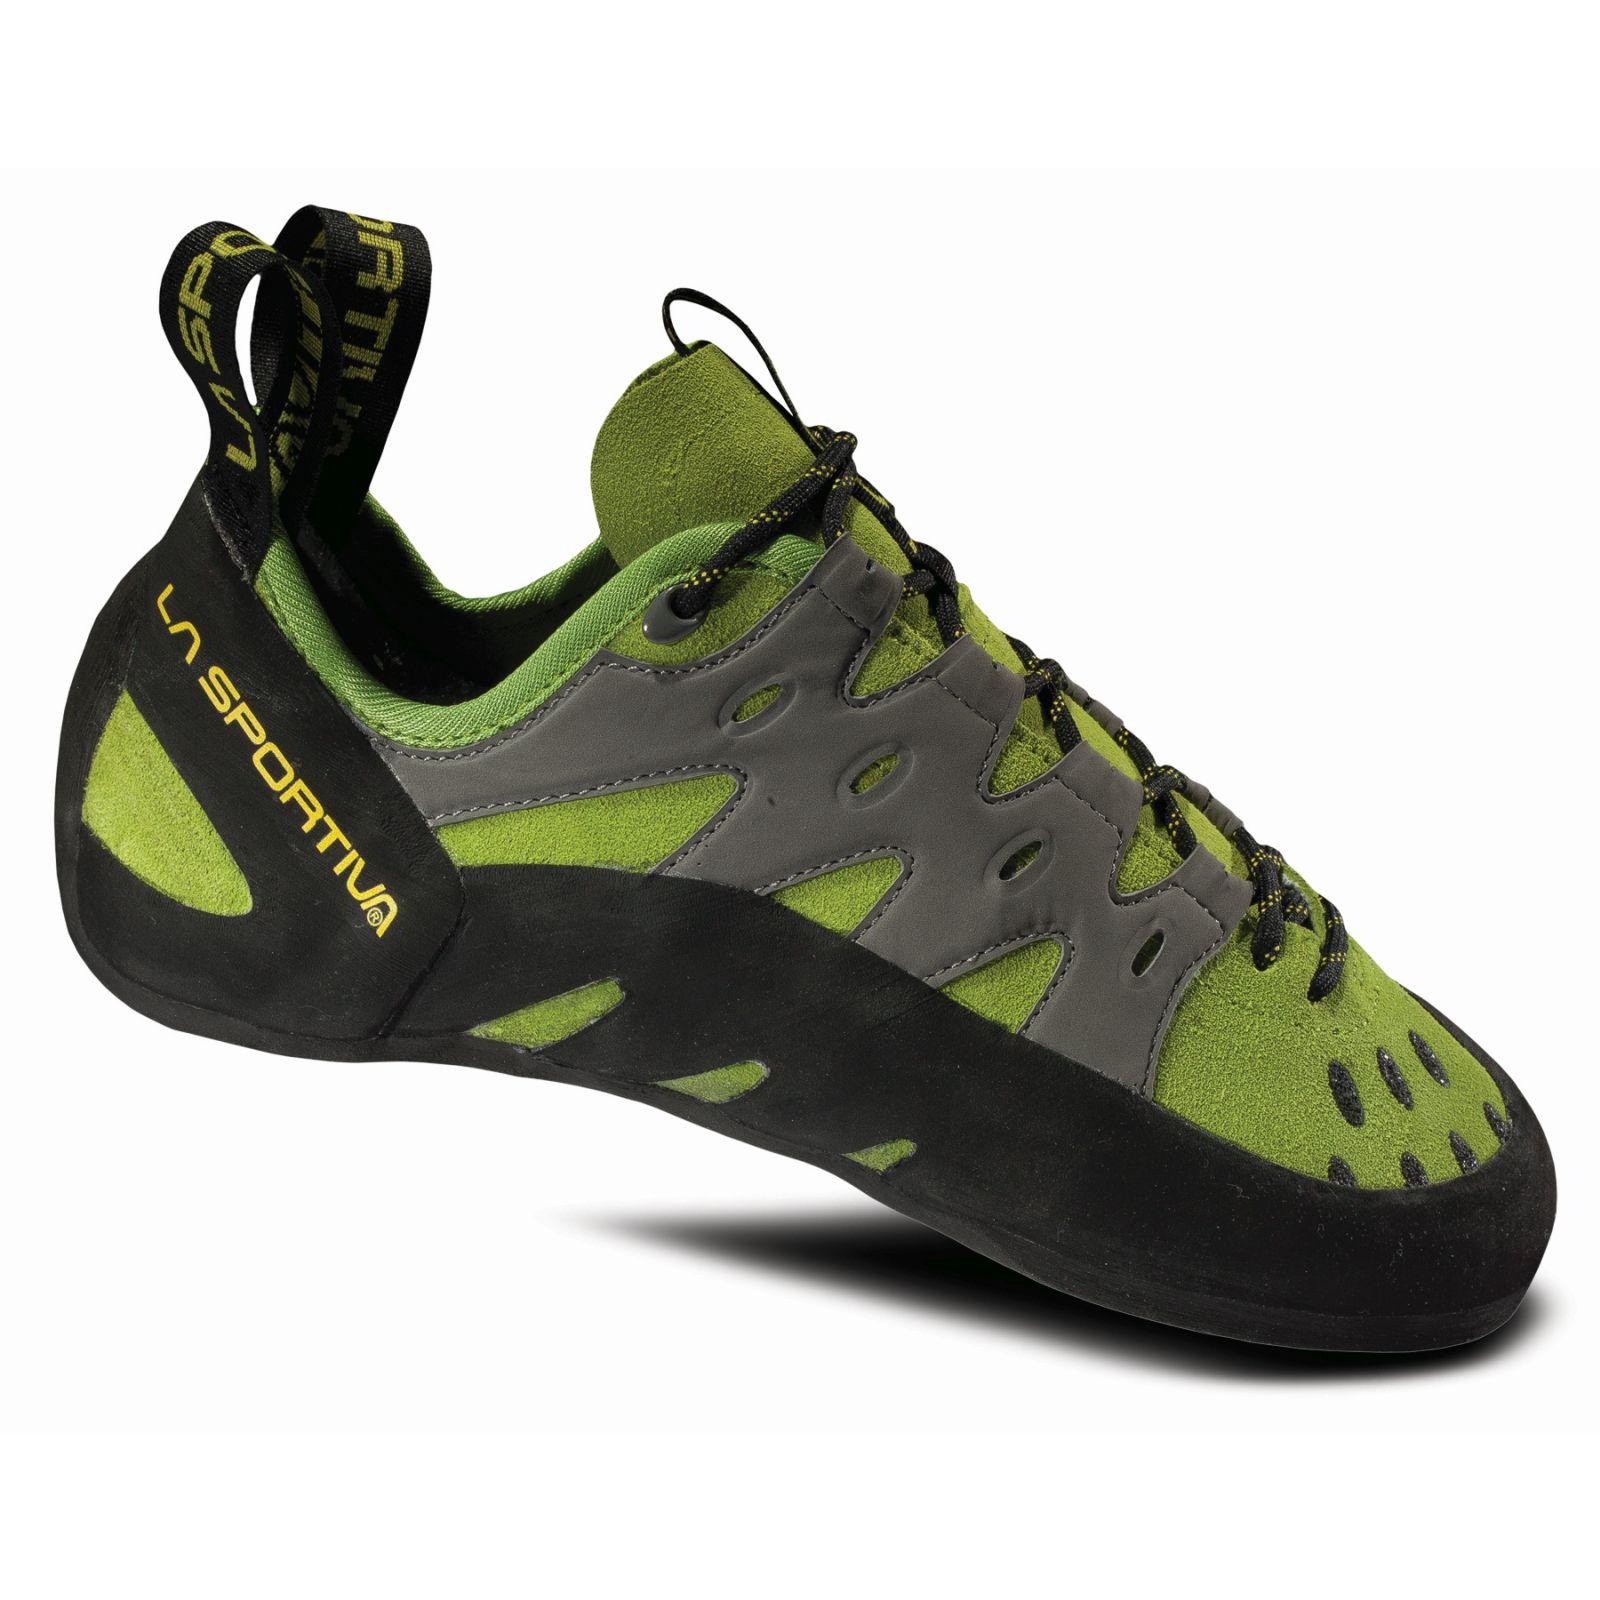 photo: La Sportiva Tarantulace climbing shoe